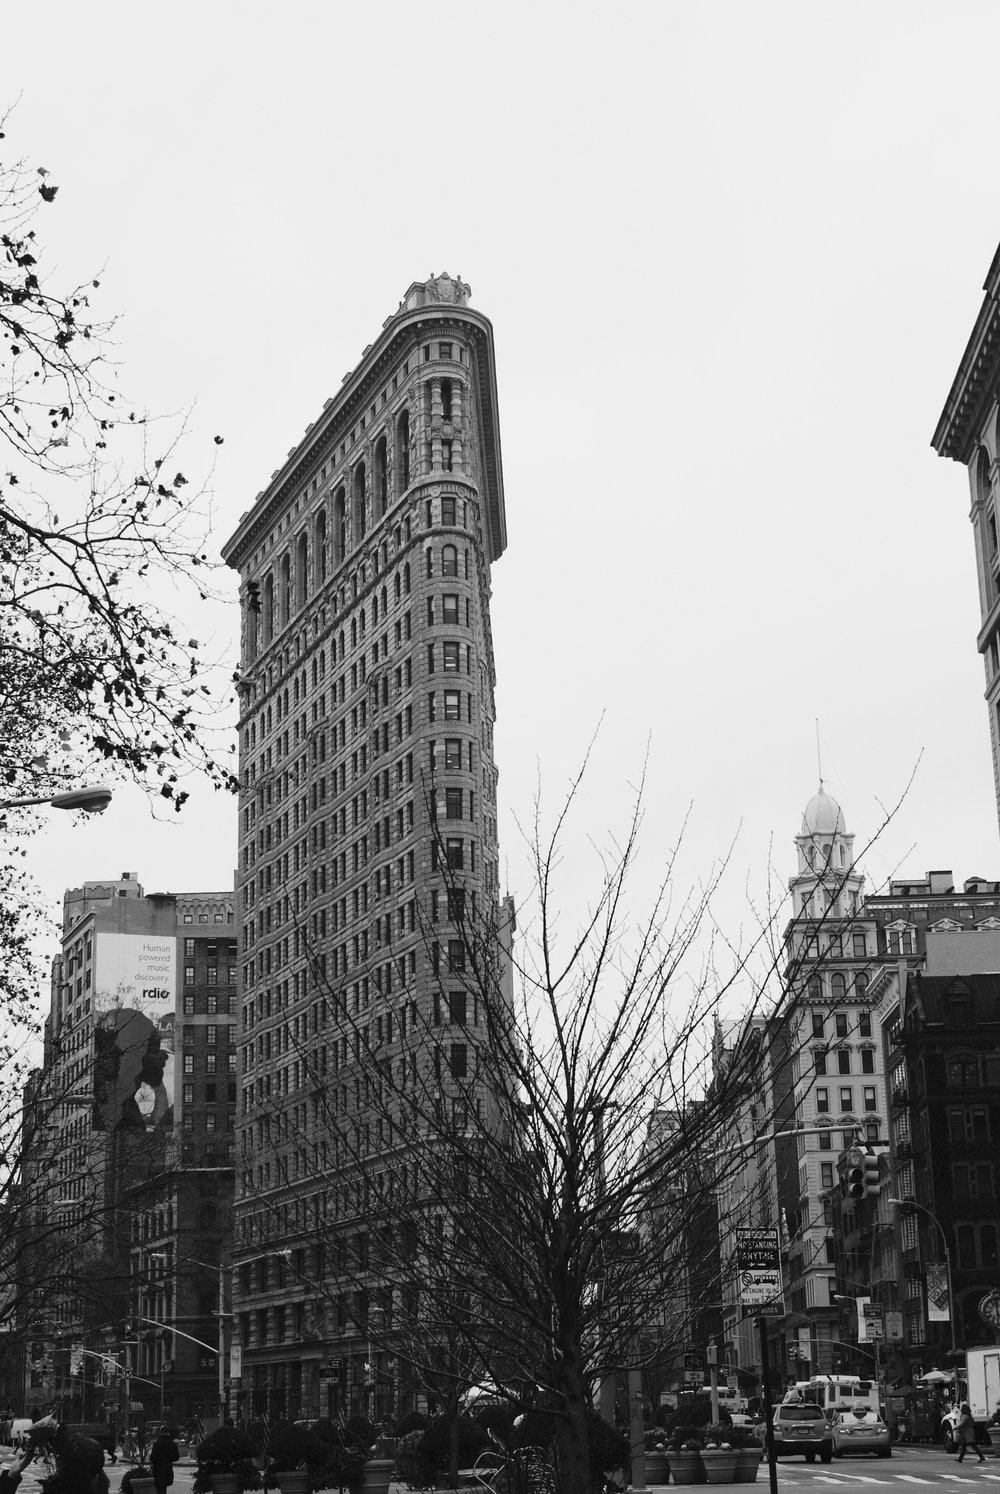 New York, Gomm Studio, Interior Design, London, Sourcing, Research, Flat Iron Building, Louise Gomm